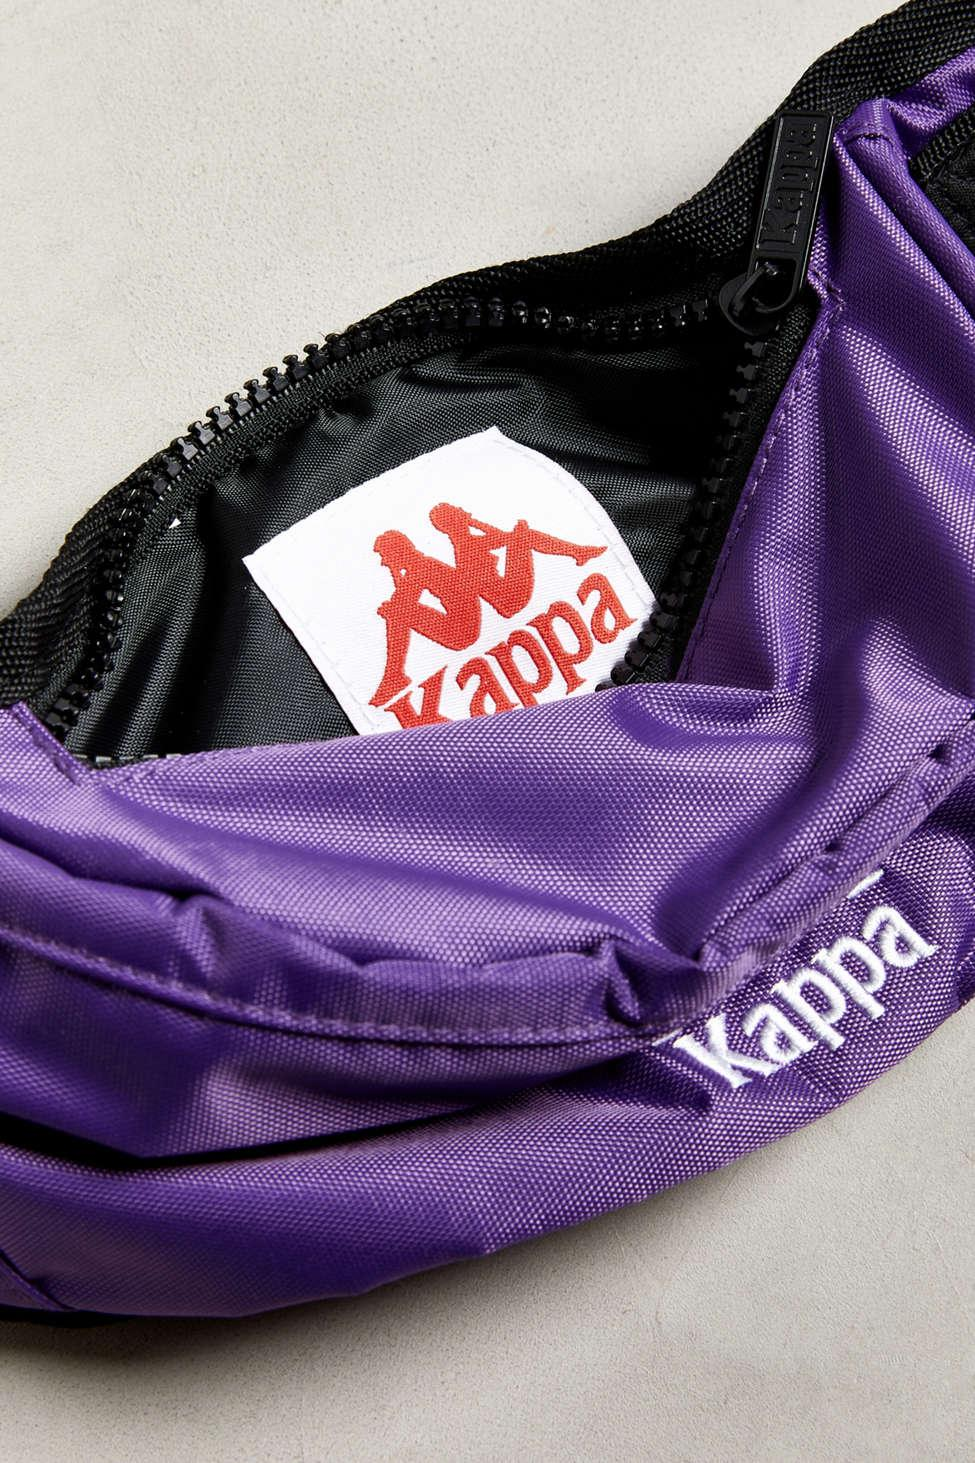 0b686ace9e Kappa Purple Uo Exclusive Anais Authentic Sling Bag for men